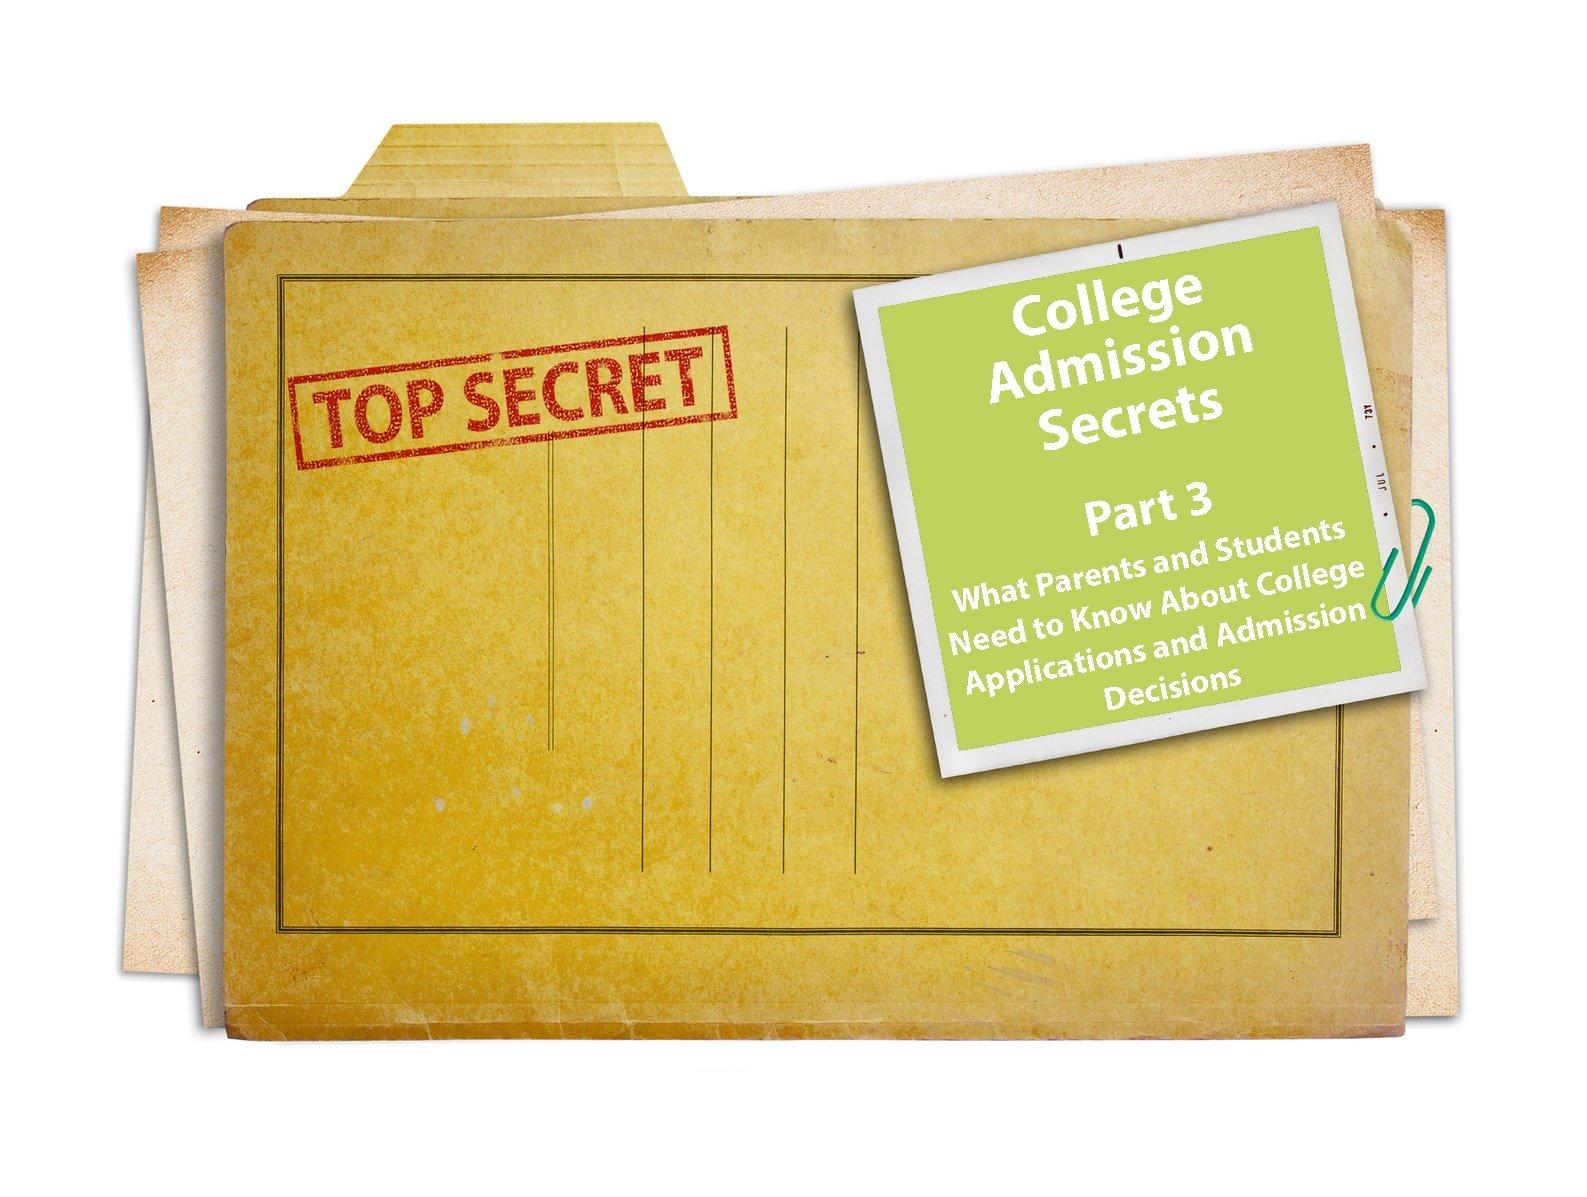 College Admission Secrets